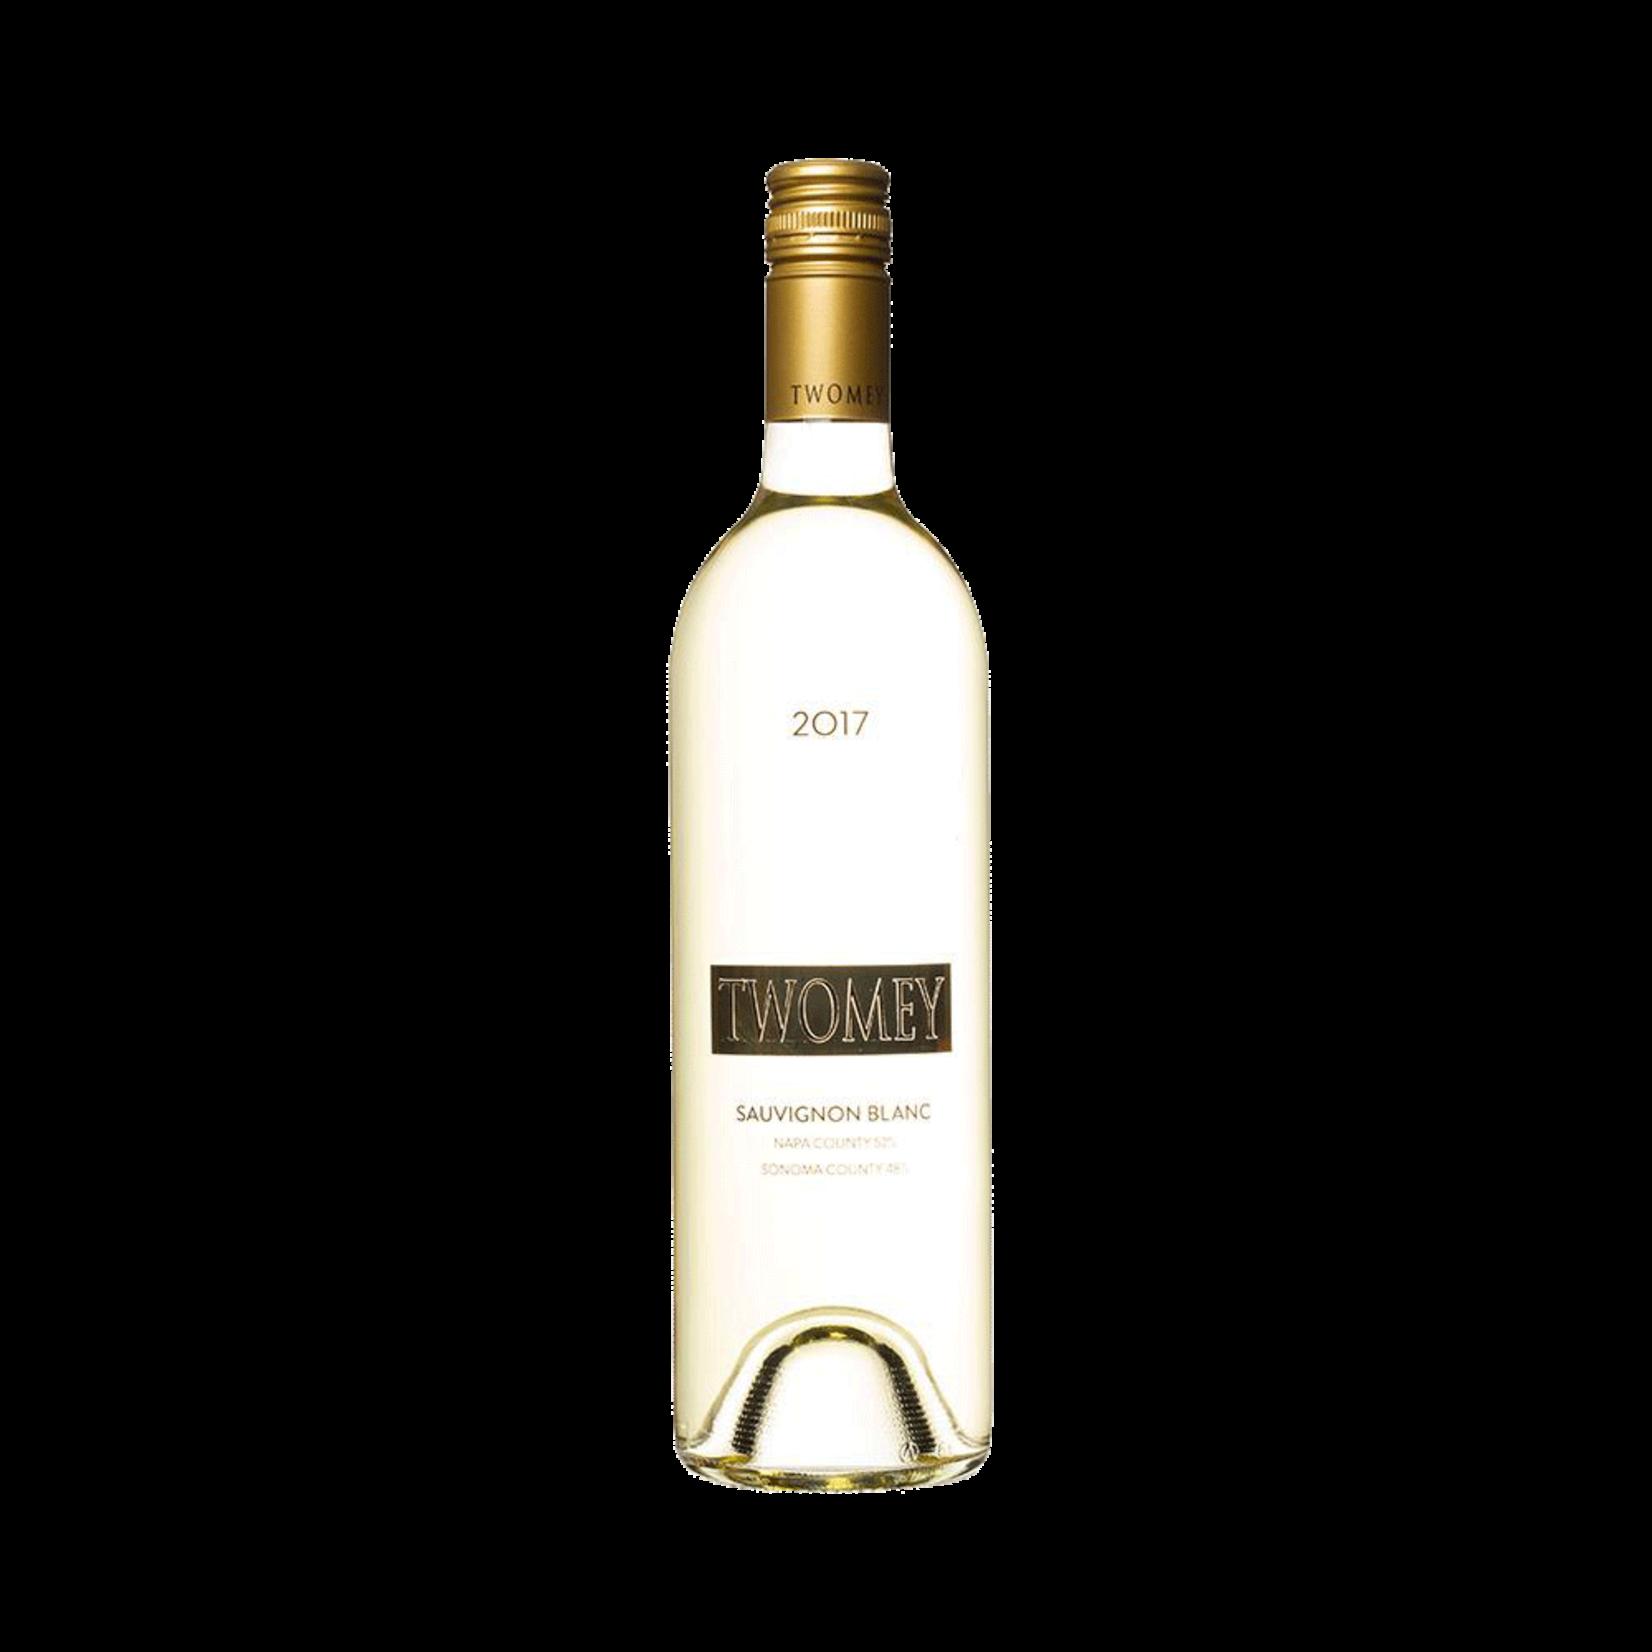 Wine Twomey Sauvignon Blanc 2017